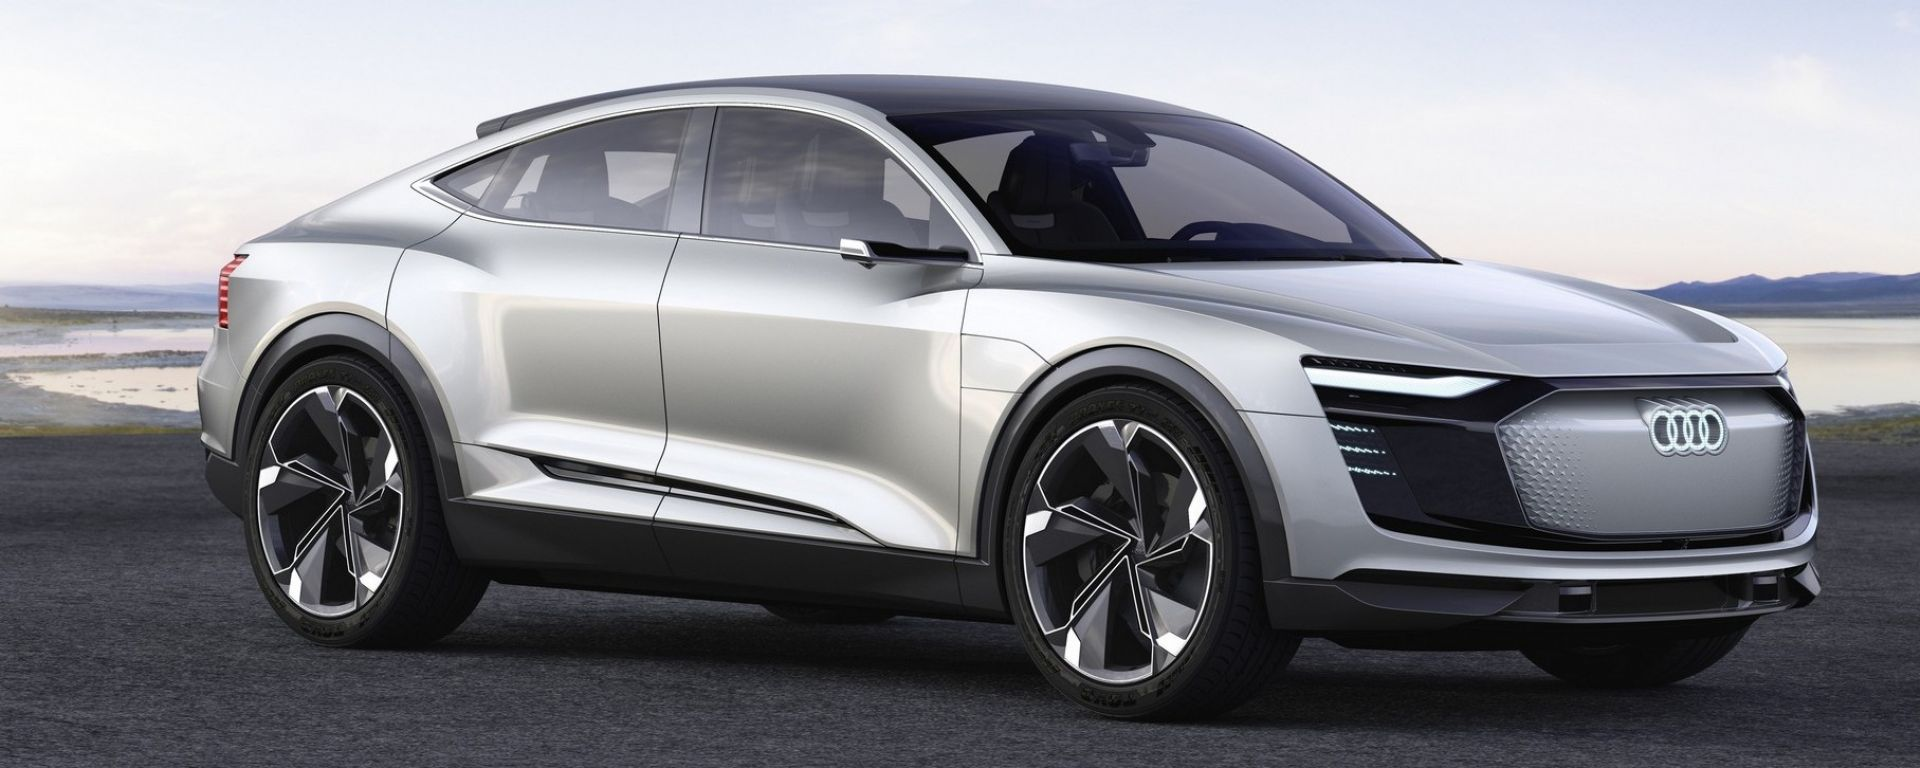 Audi e-tron Sportback concept: arriverà nel 2019